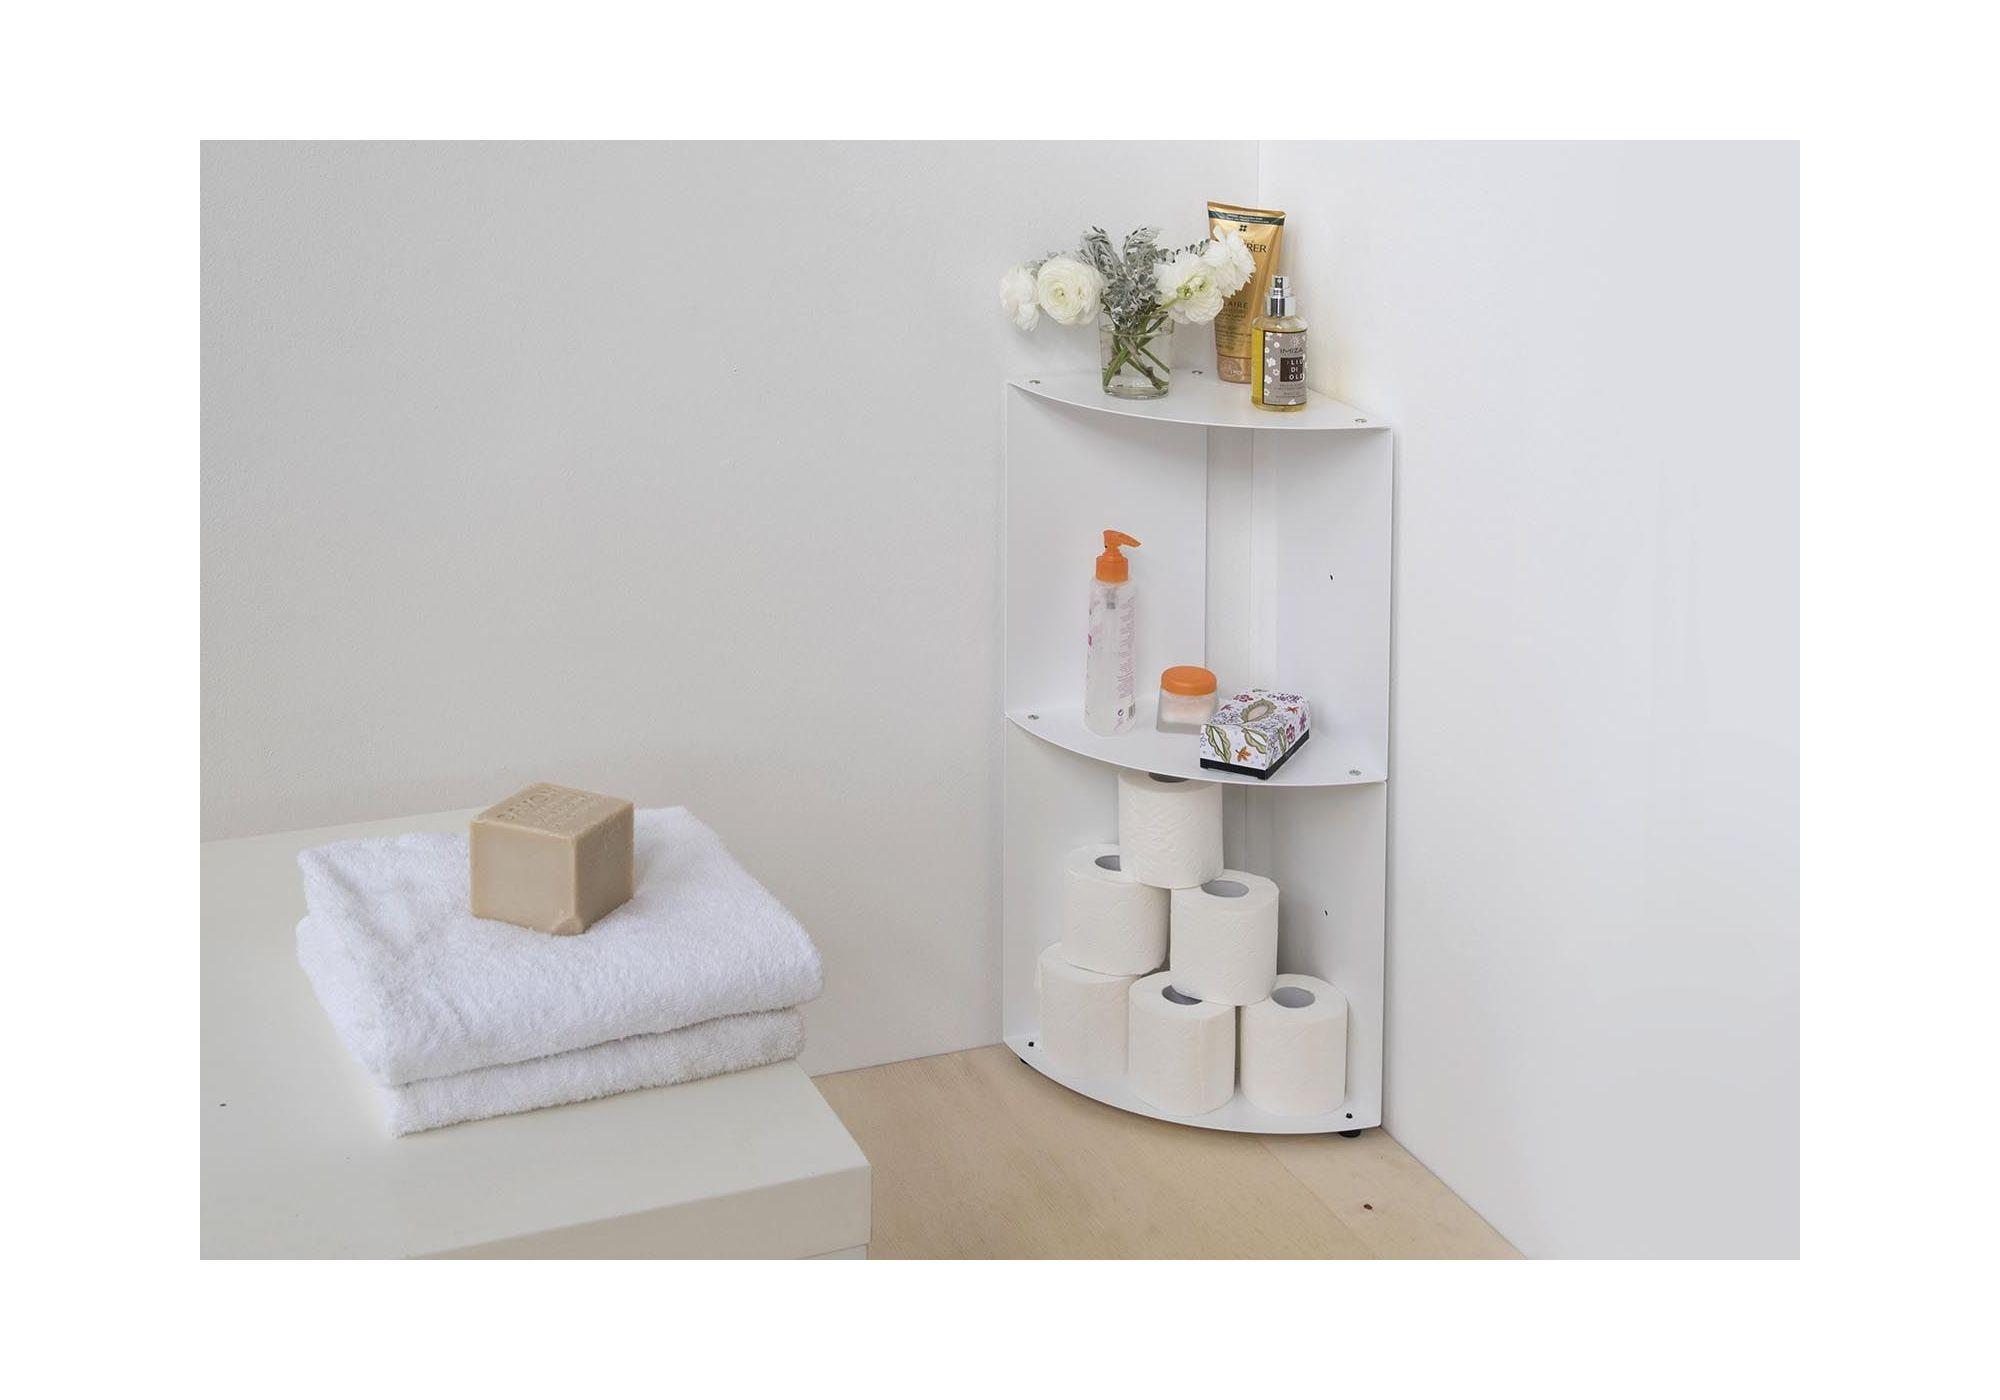 vente etagere angle salle de bain dangolo metal 25x25x70cm